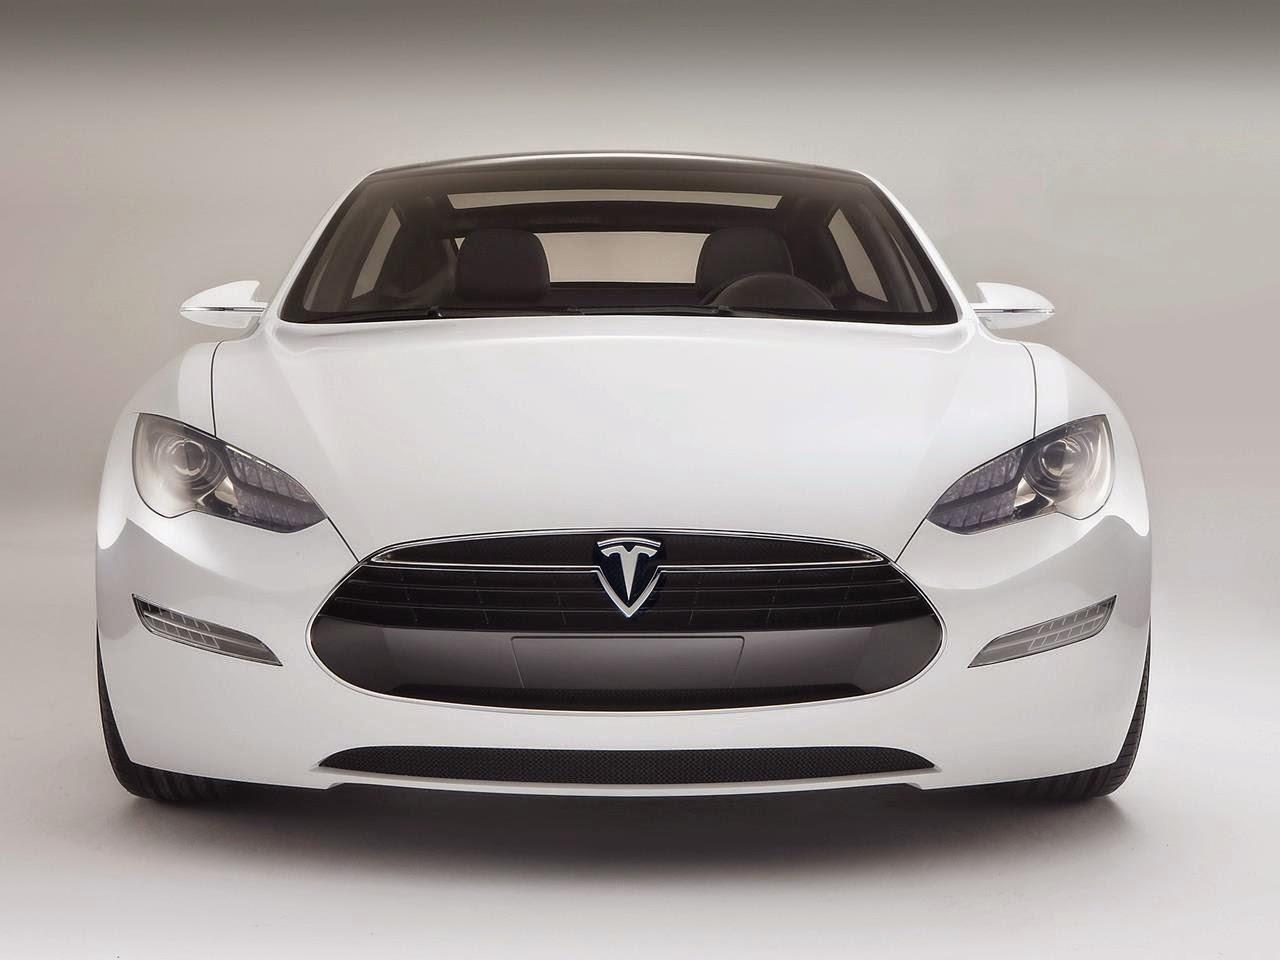 White color latest hd car photos